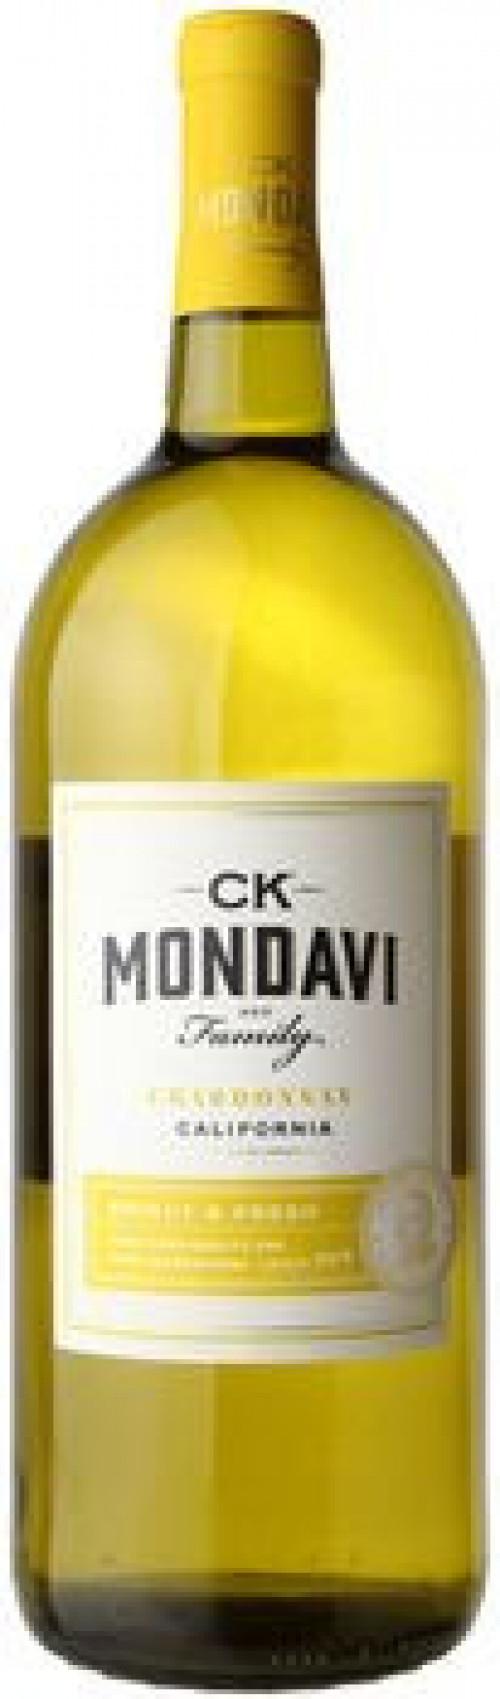 CK Mondavi Chardonnay 1.5 Ltr